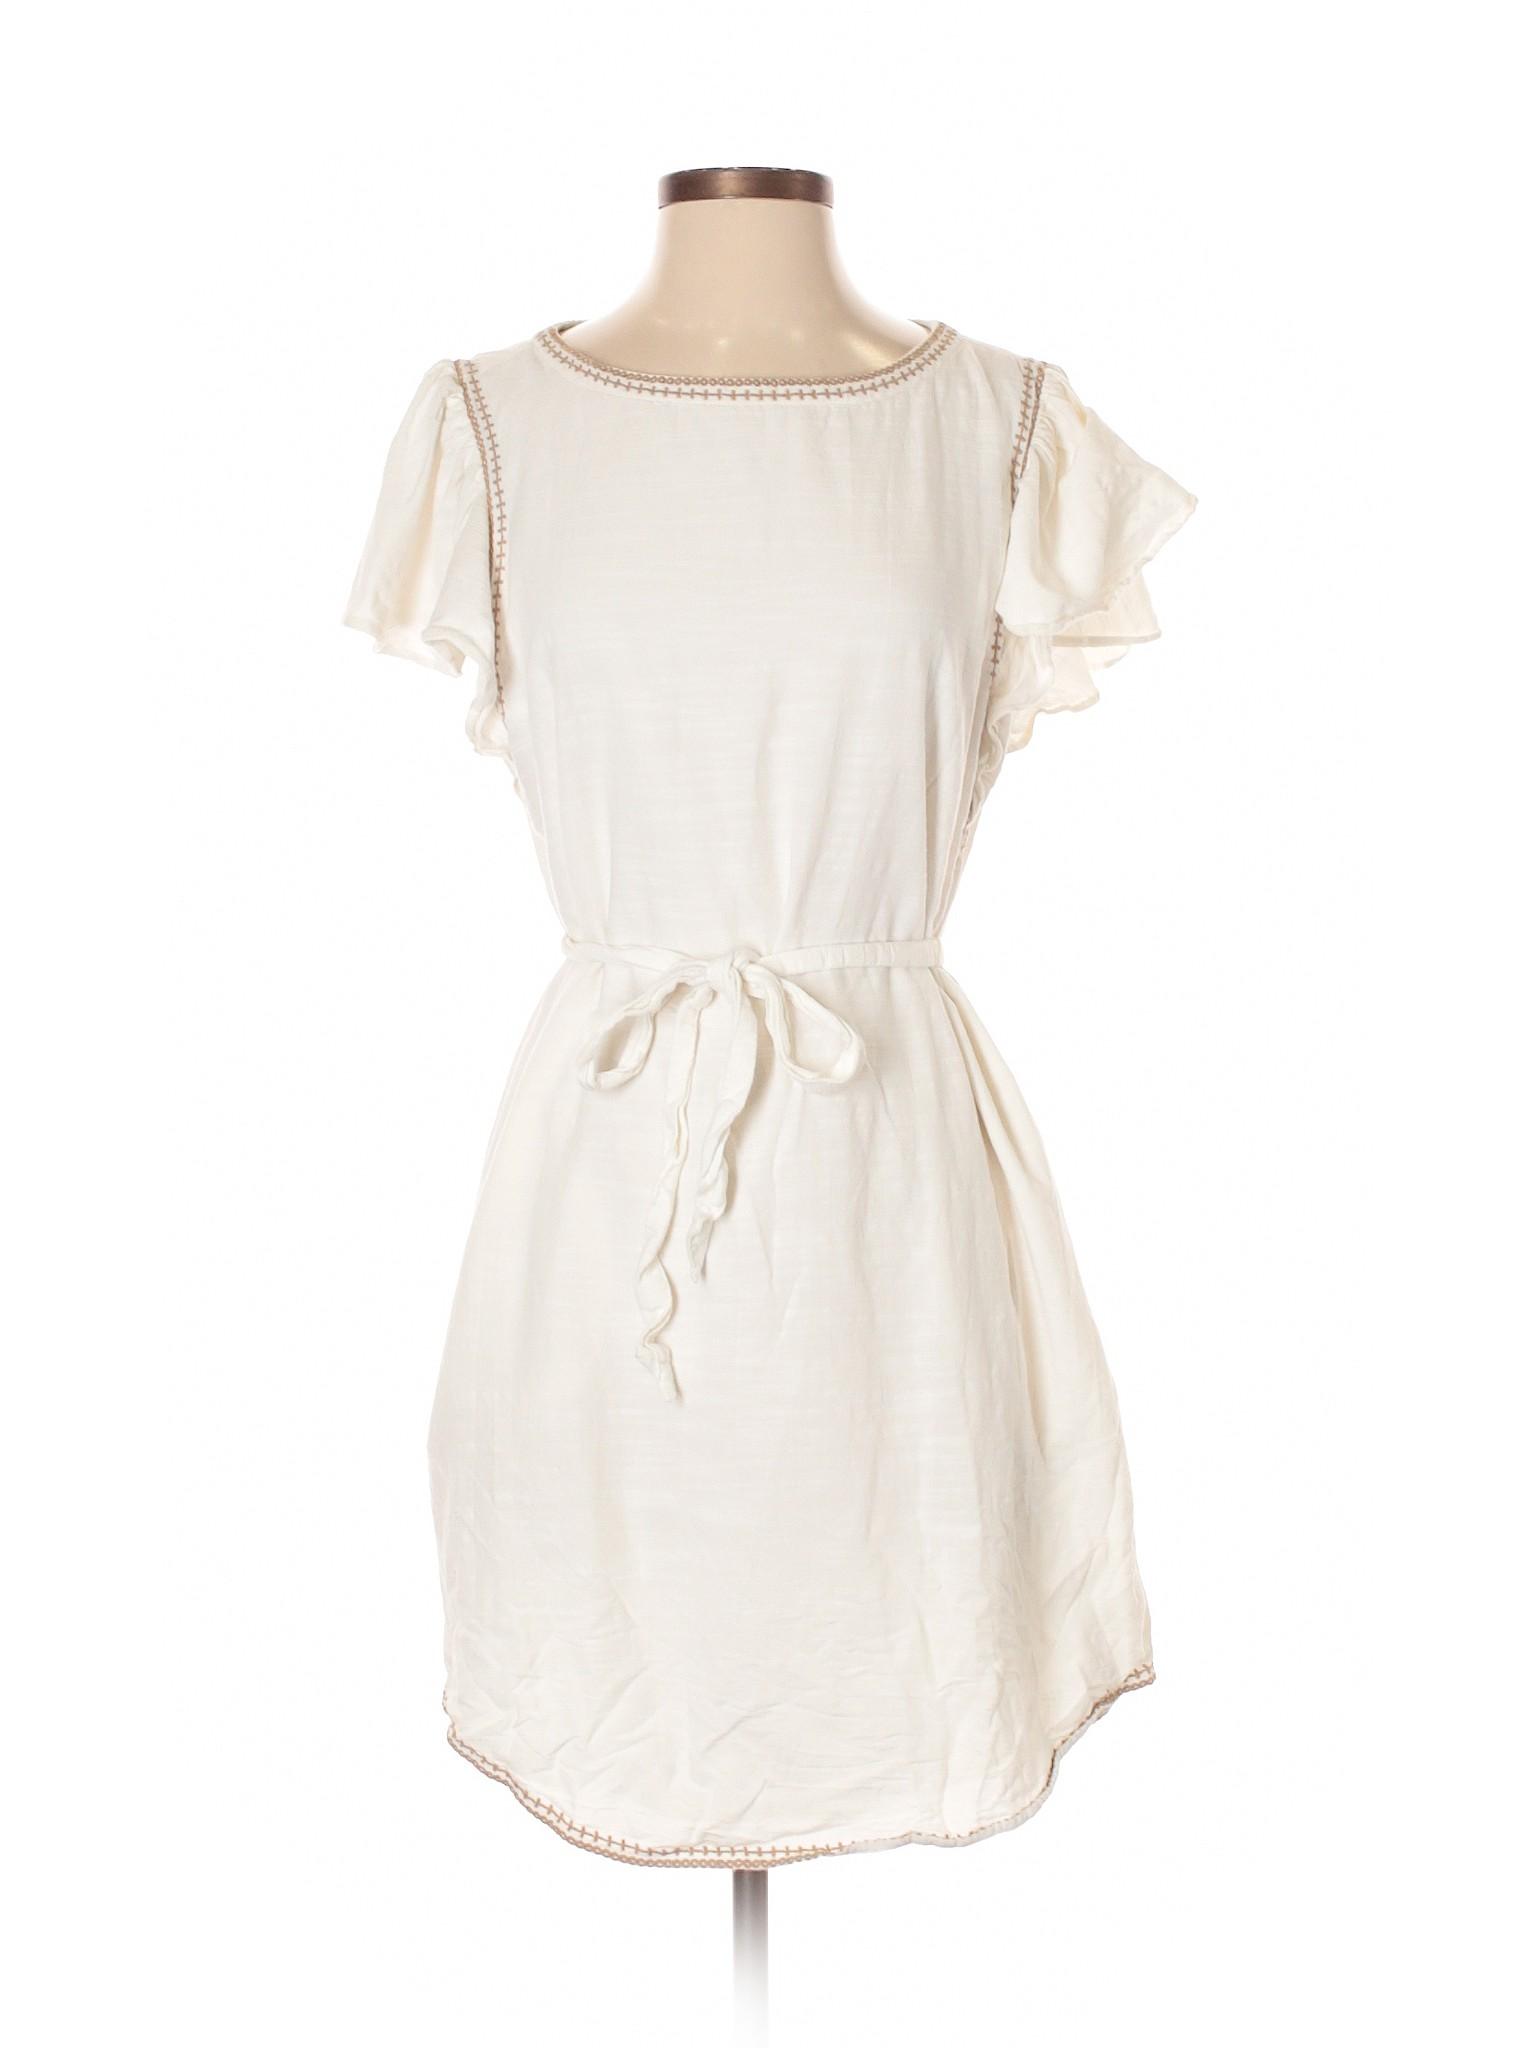 Dress Casual Selling Dress Gap Selling Casual Selling Casual Gap Casual Dress Selling Gap Gap EqAaxdwYq